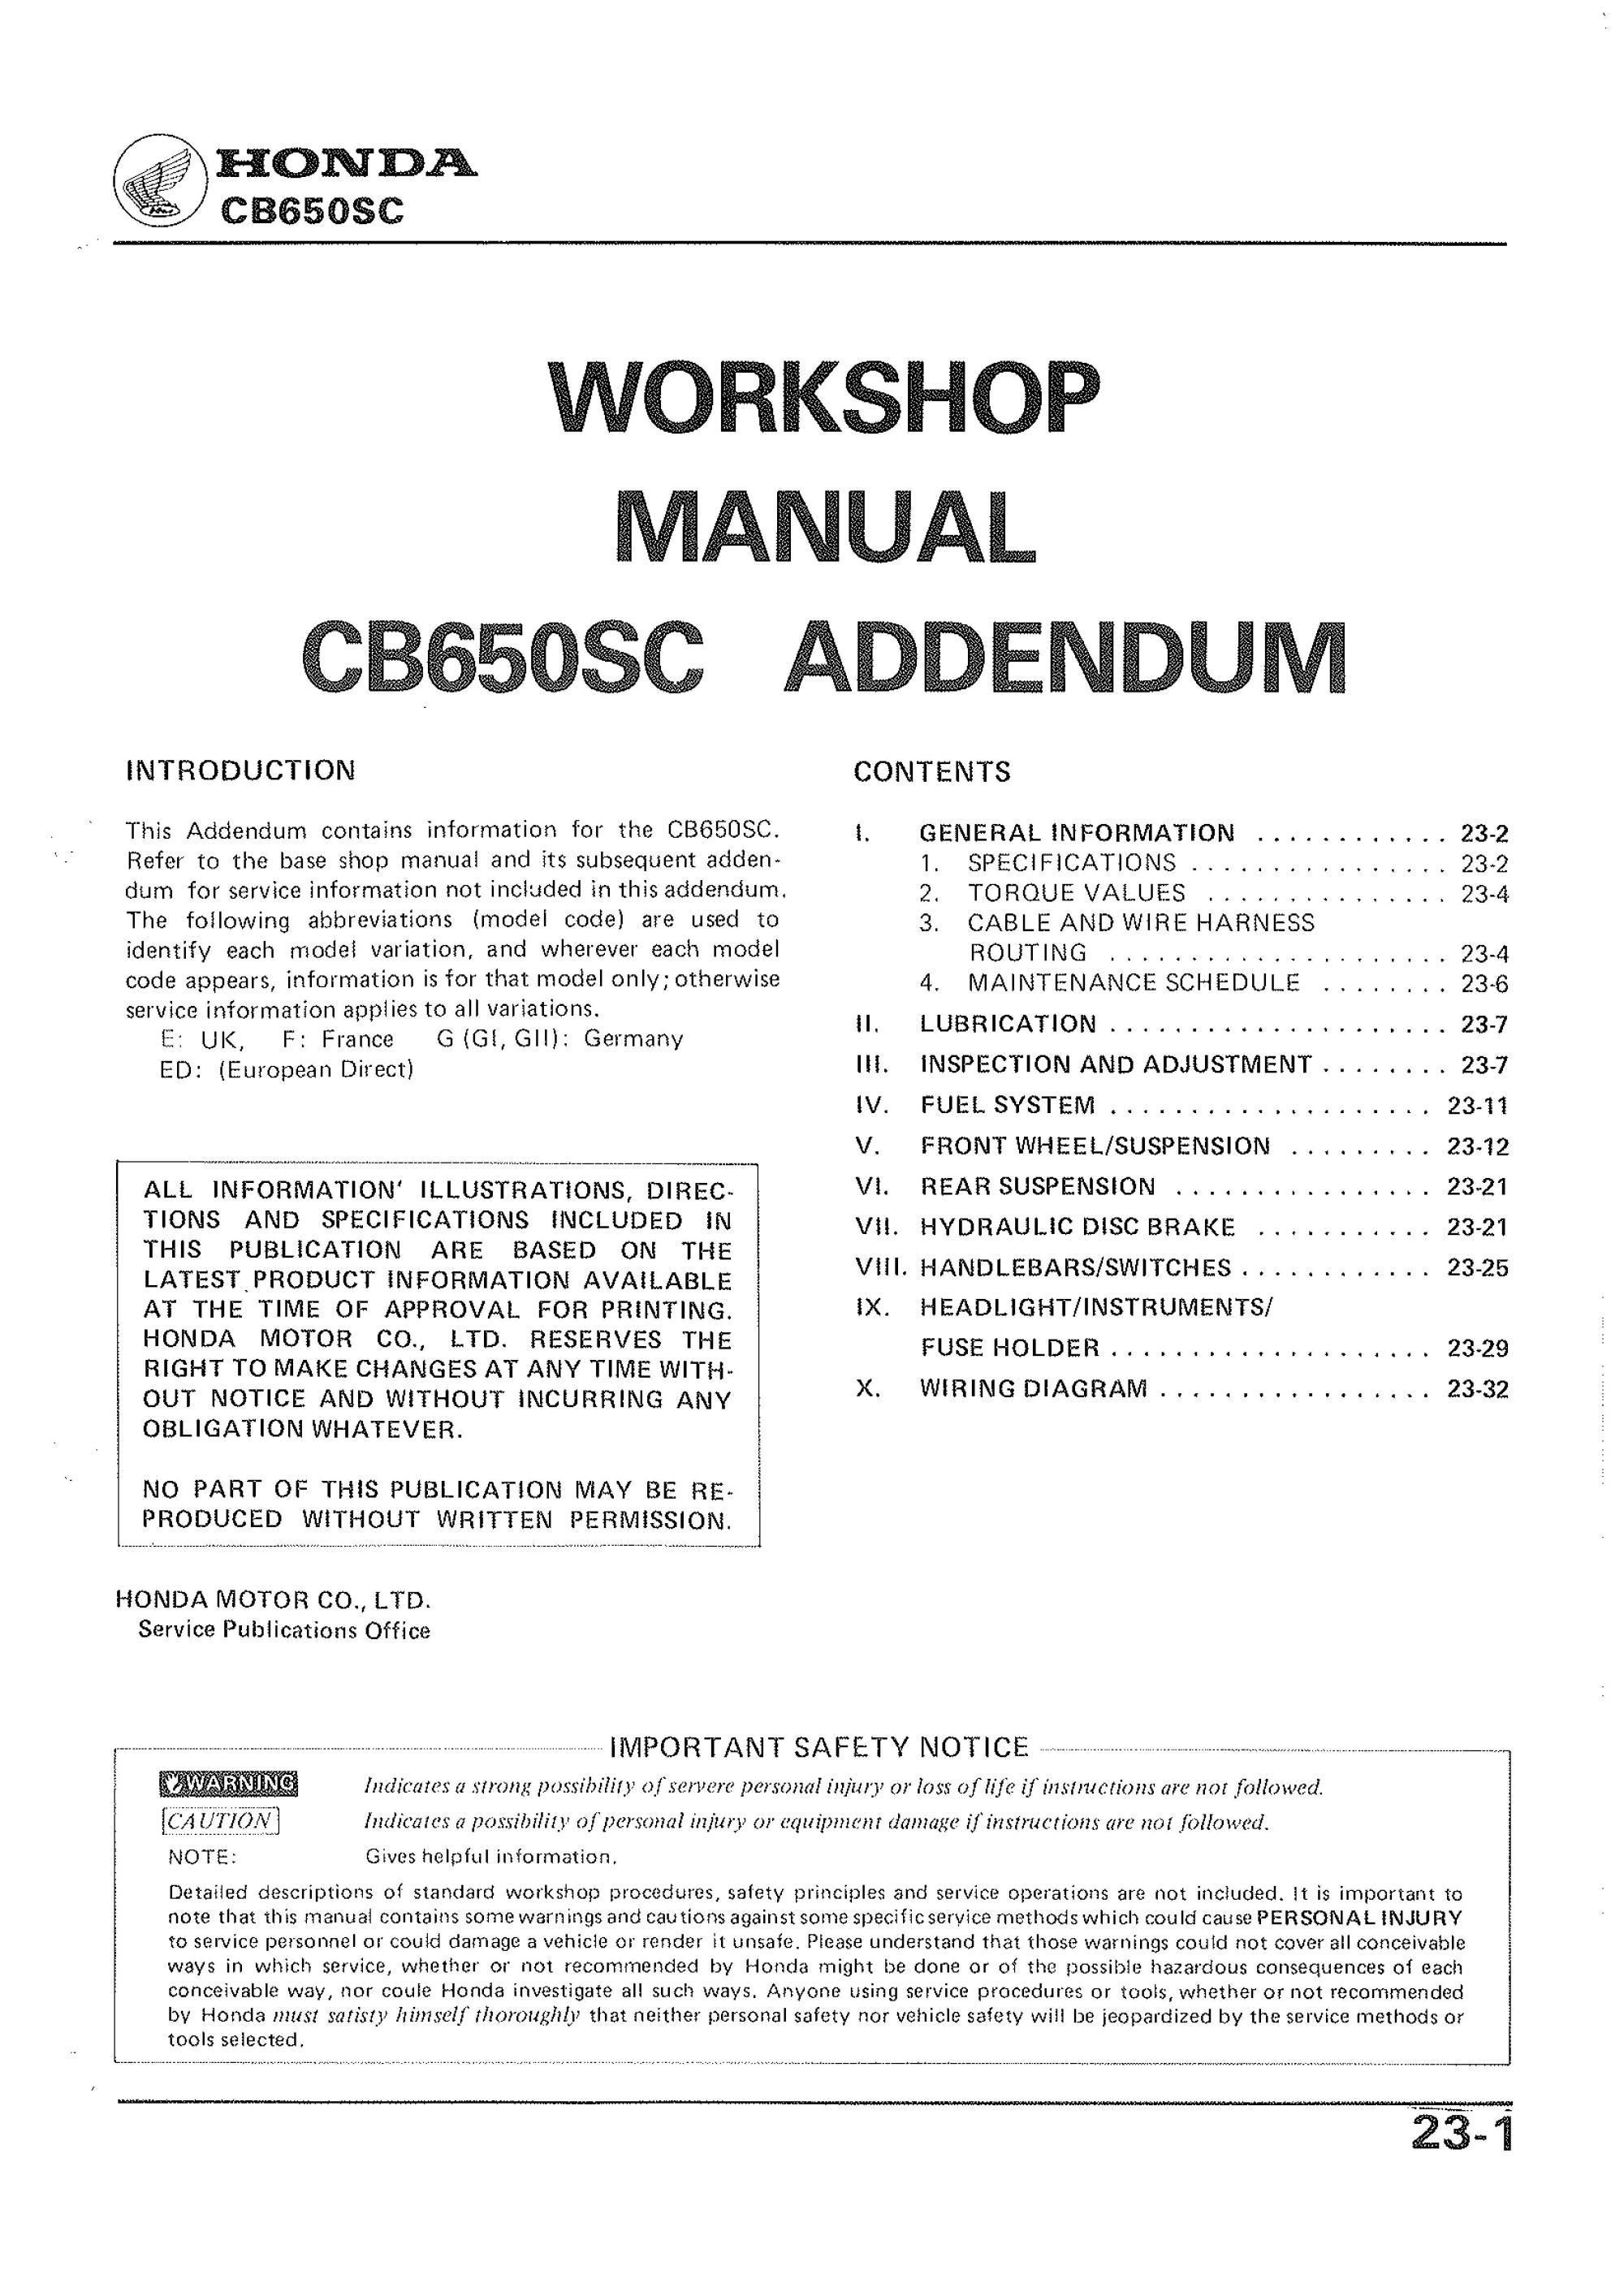 hight resolution of workshop manual for honda cb650sc addendum